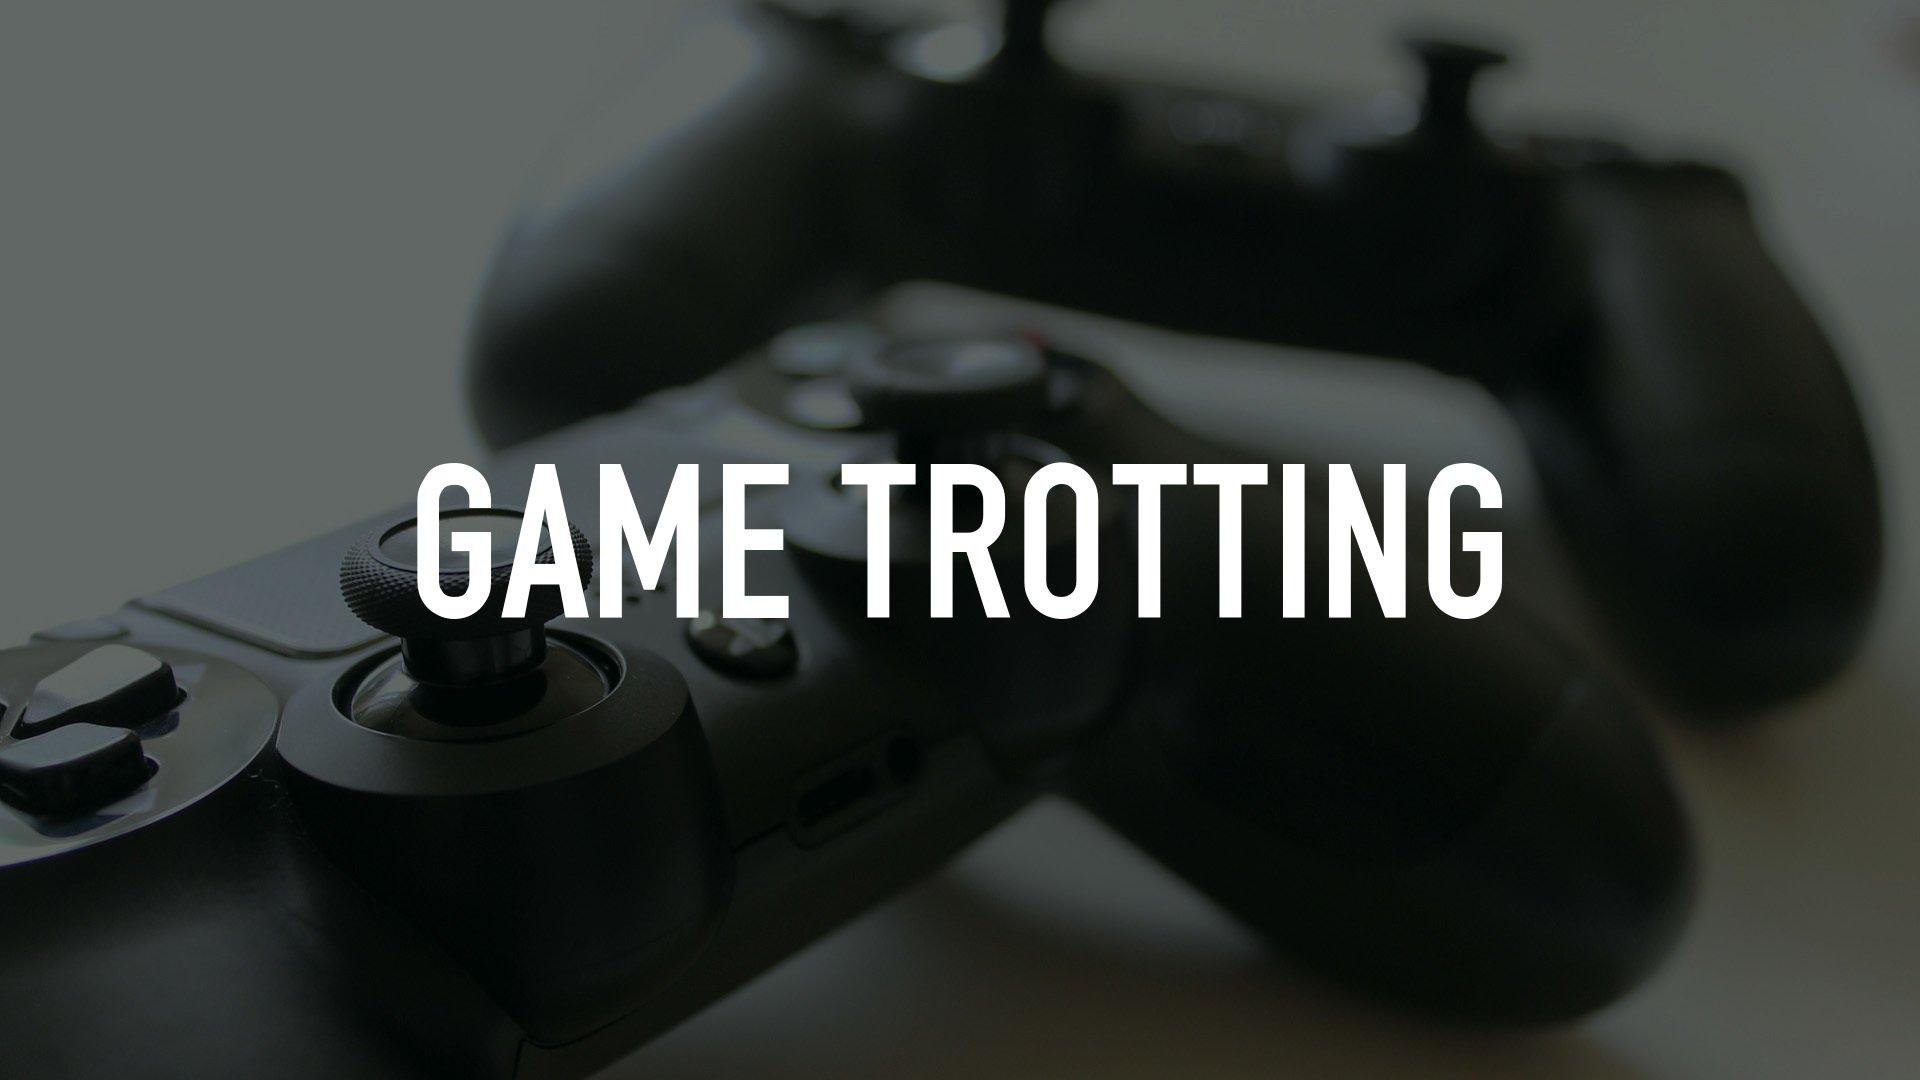 Game Trotting